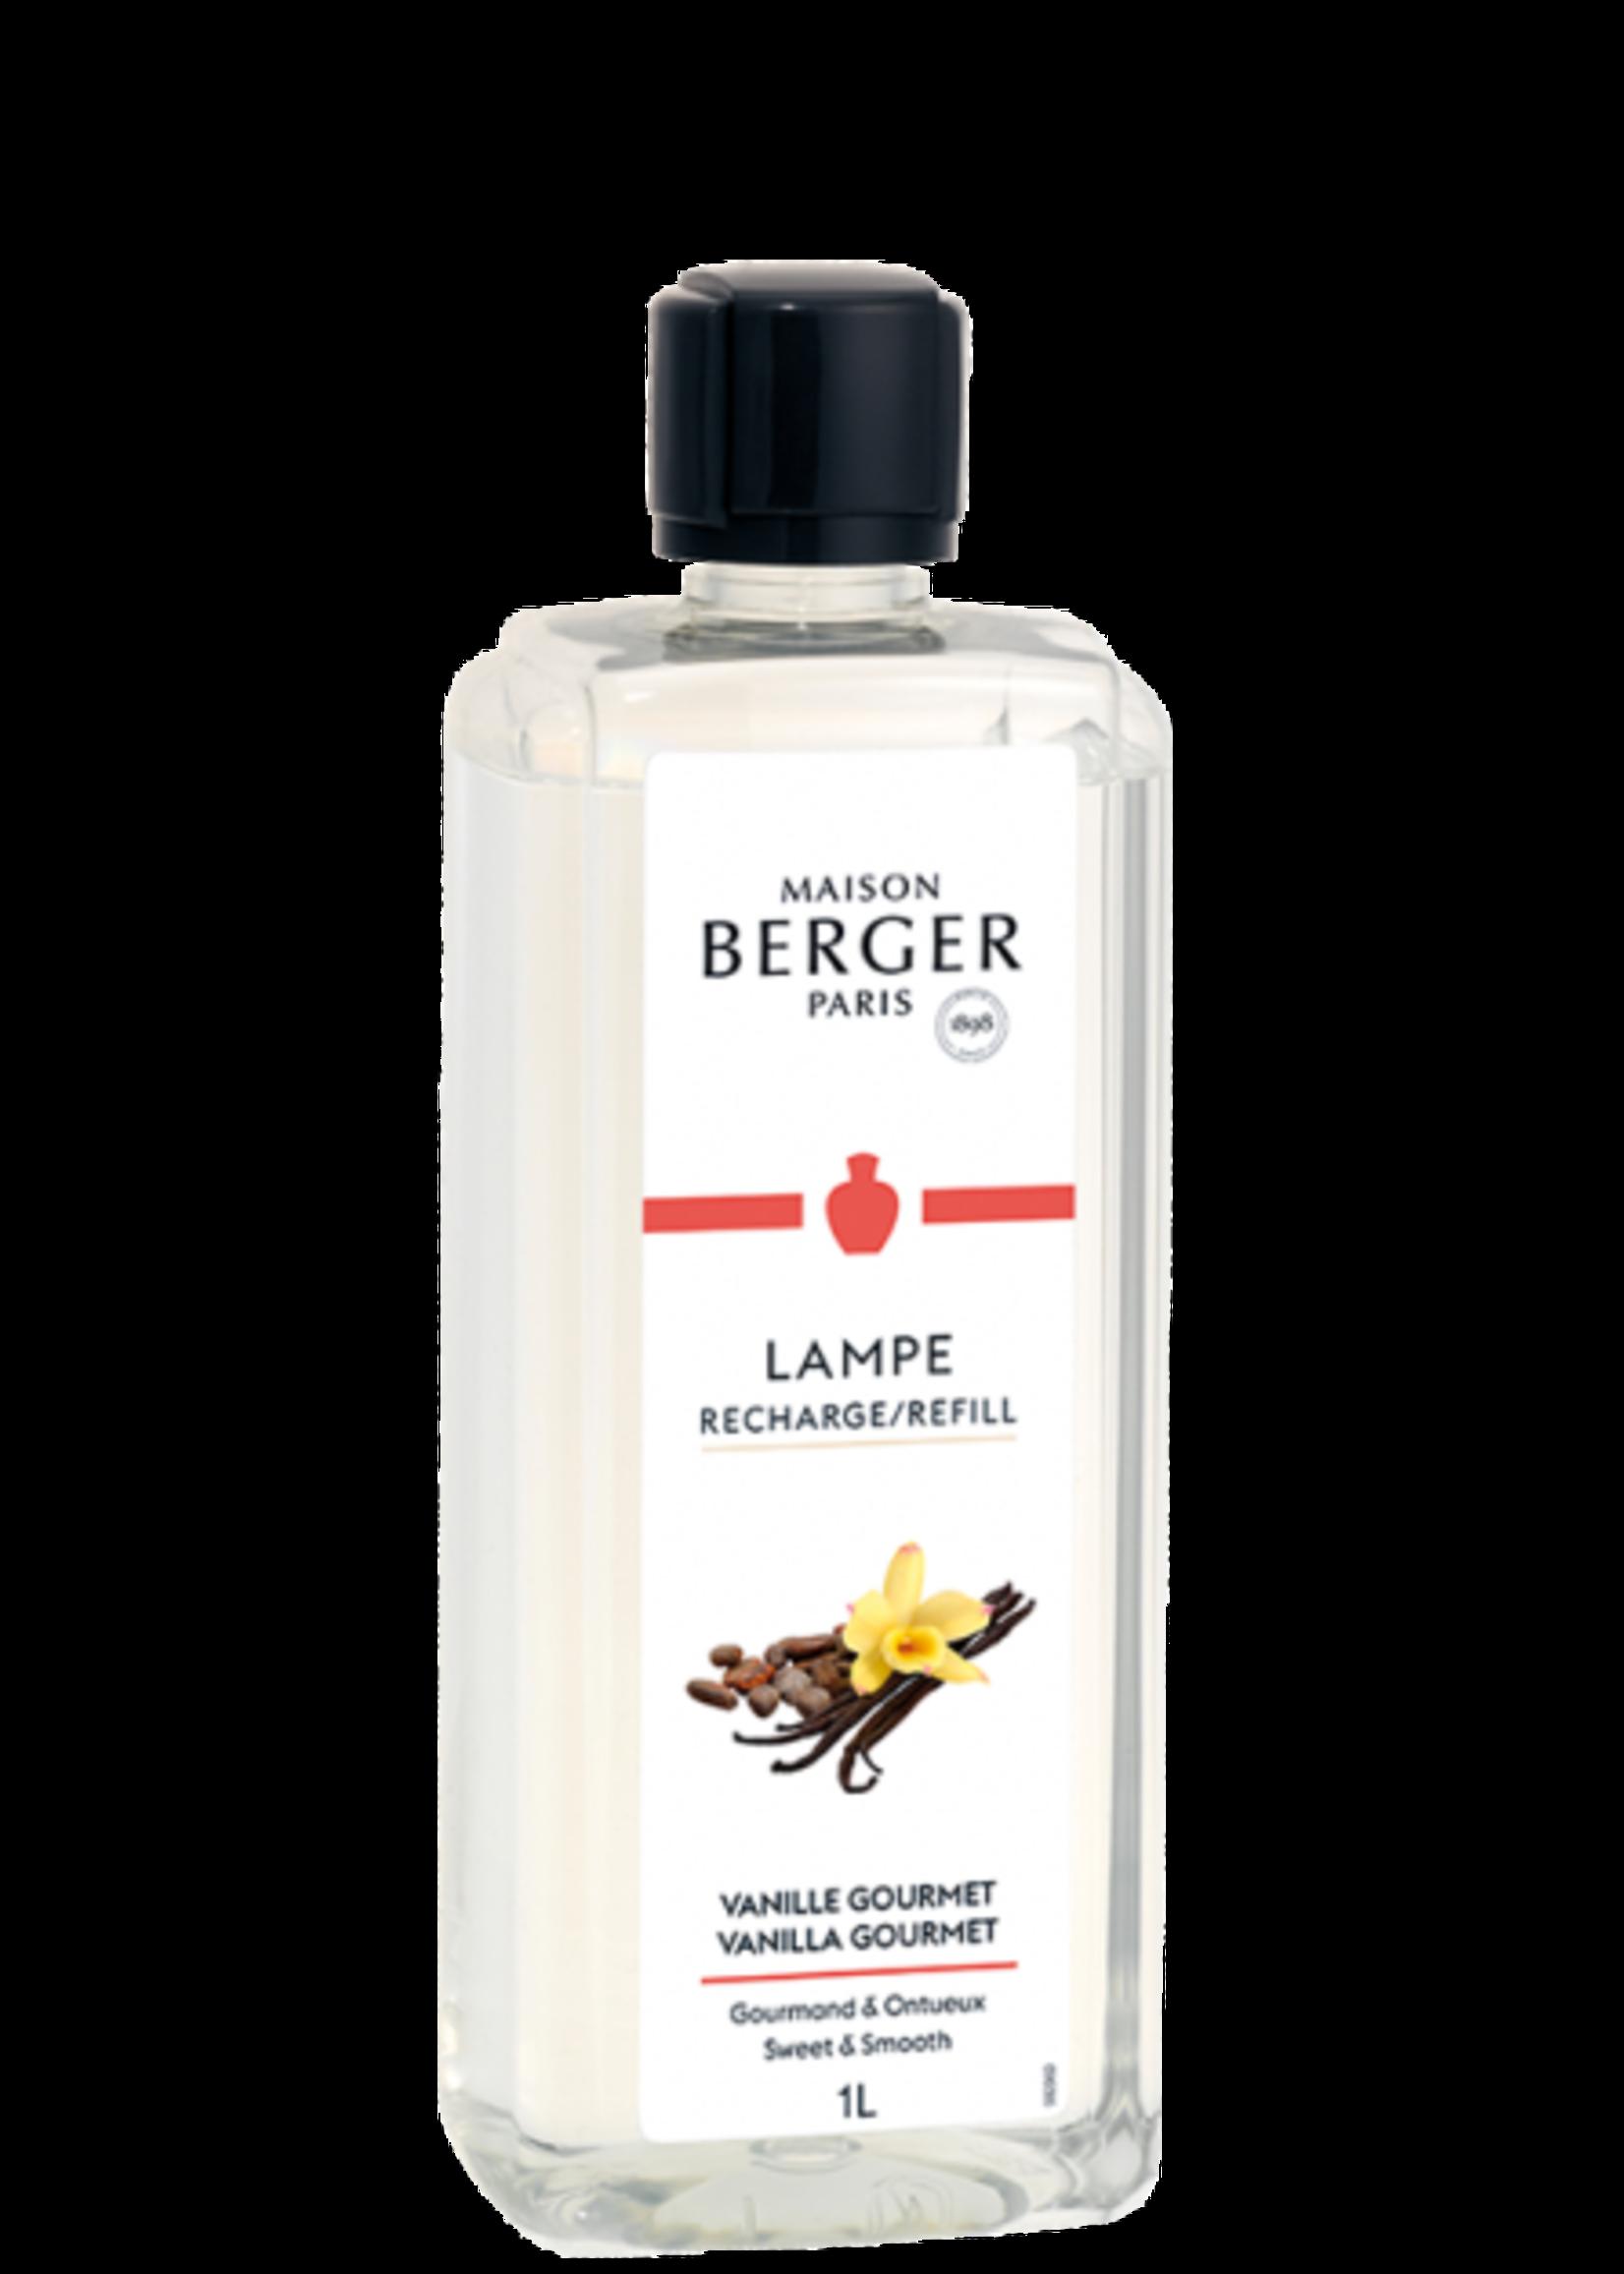 Lampe Berger Lampe Berger Huisparfum Vanille Gourmet